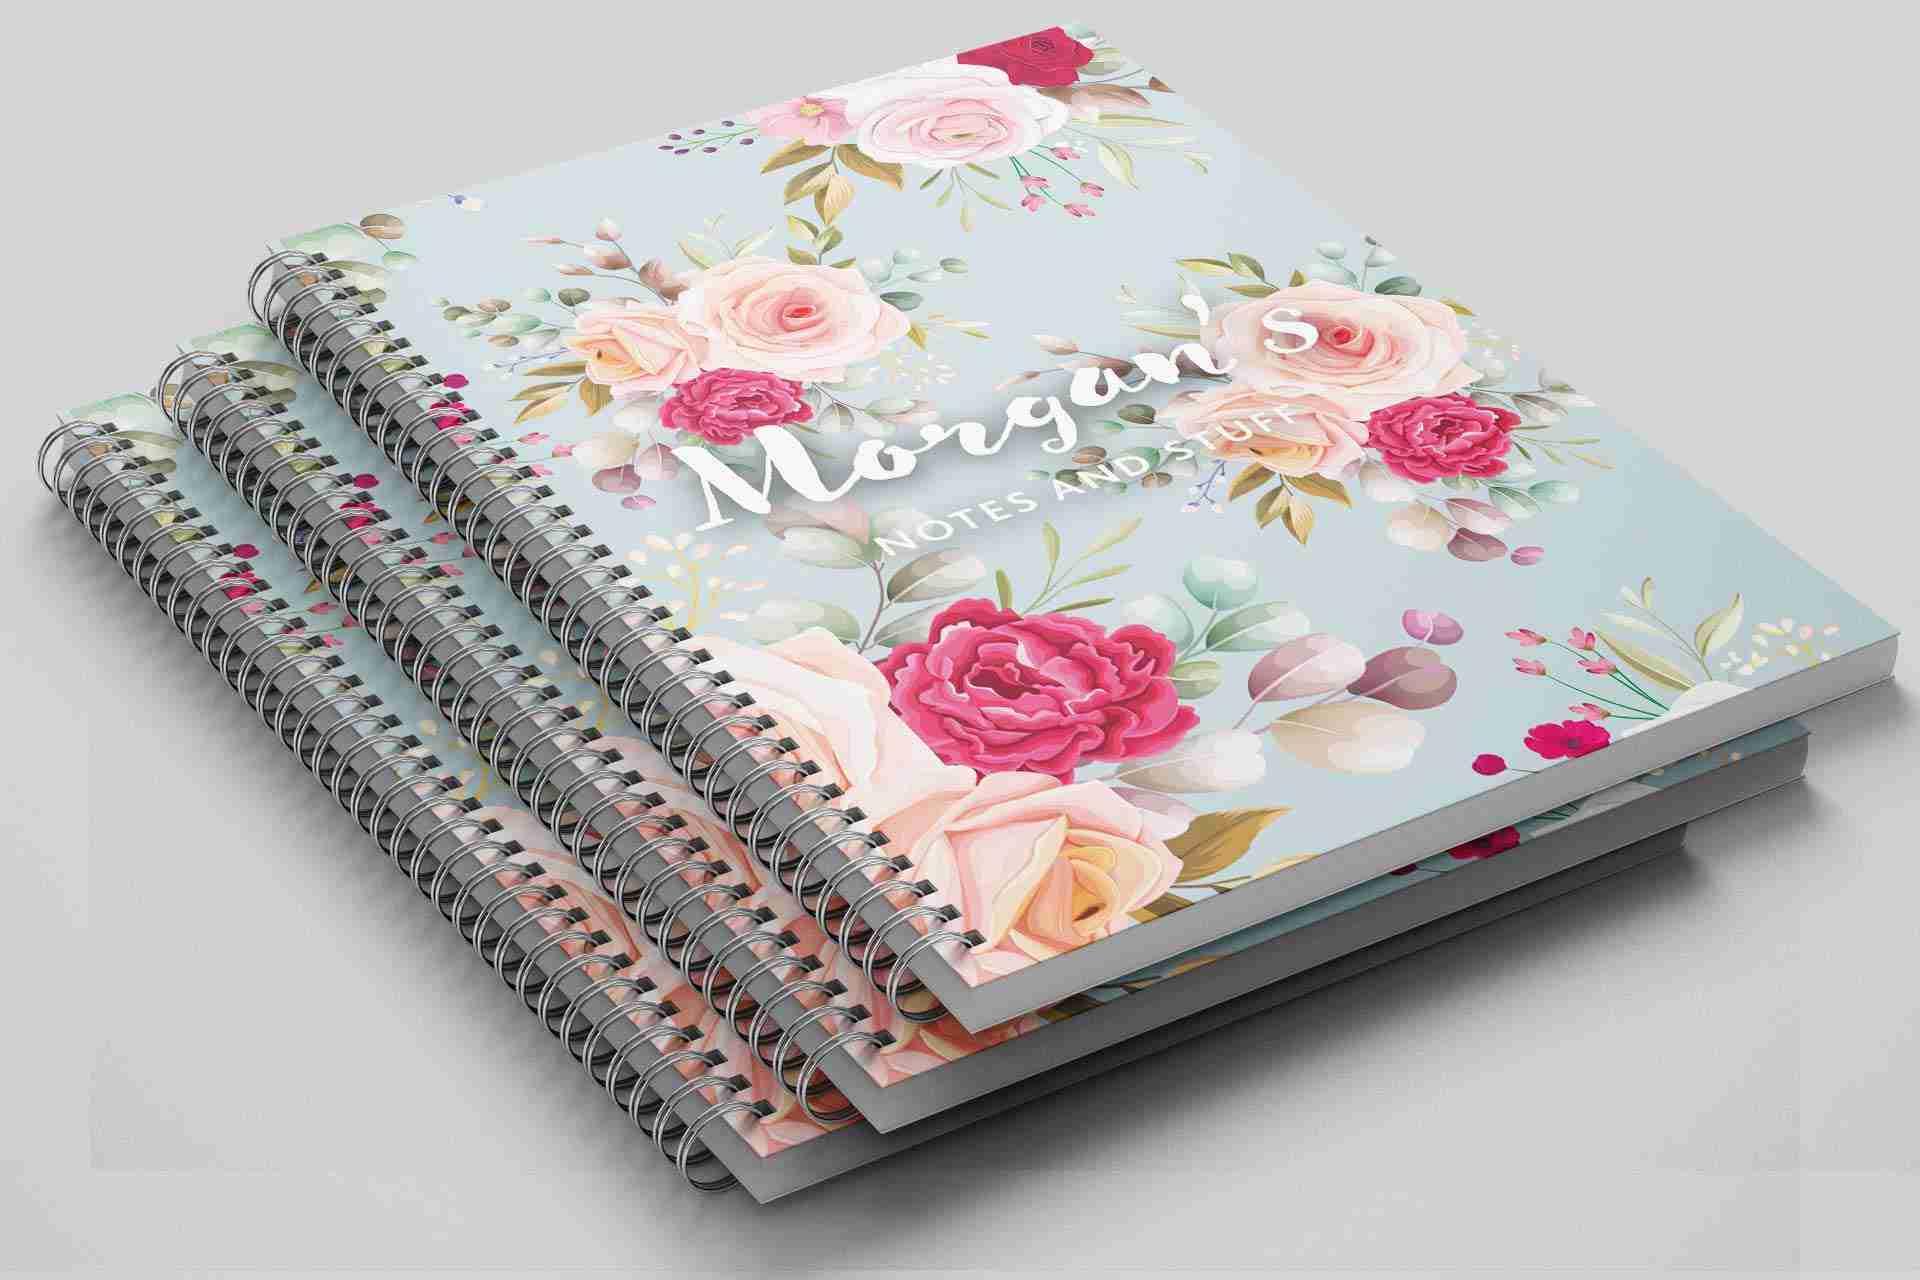 Set-of-3-notebooks-Design-option-2